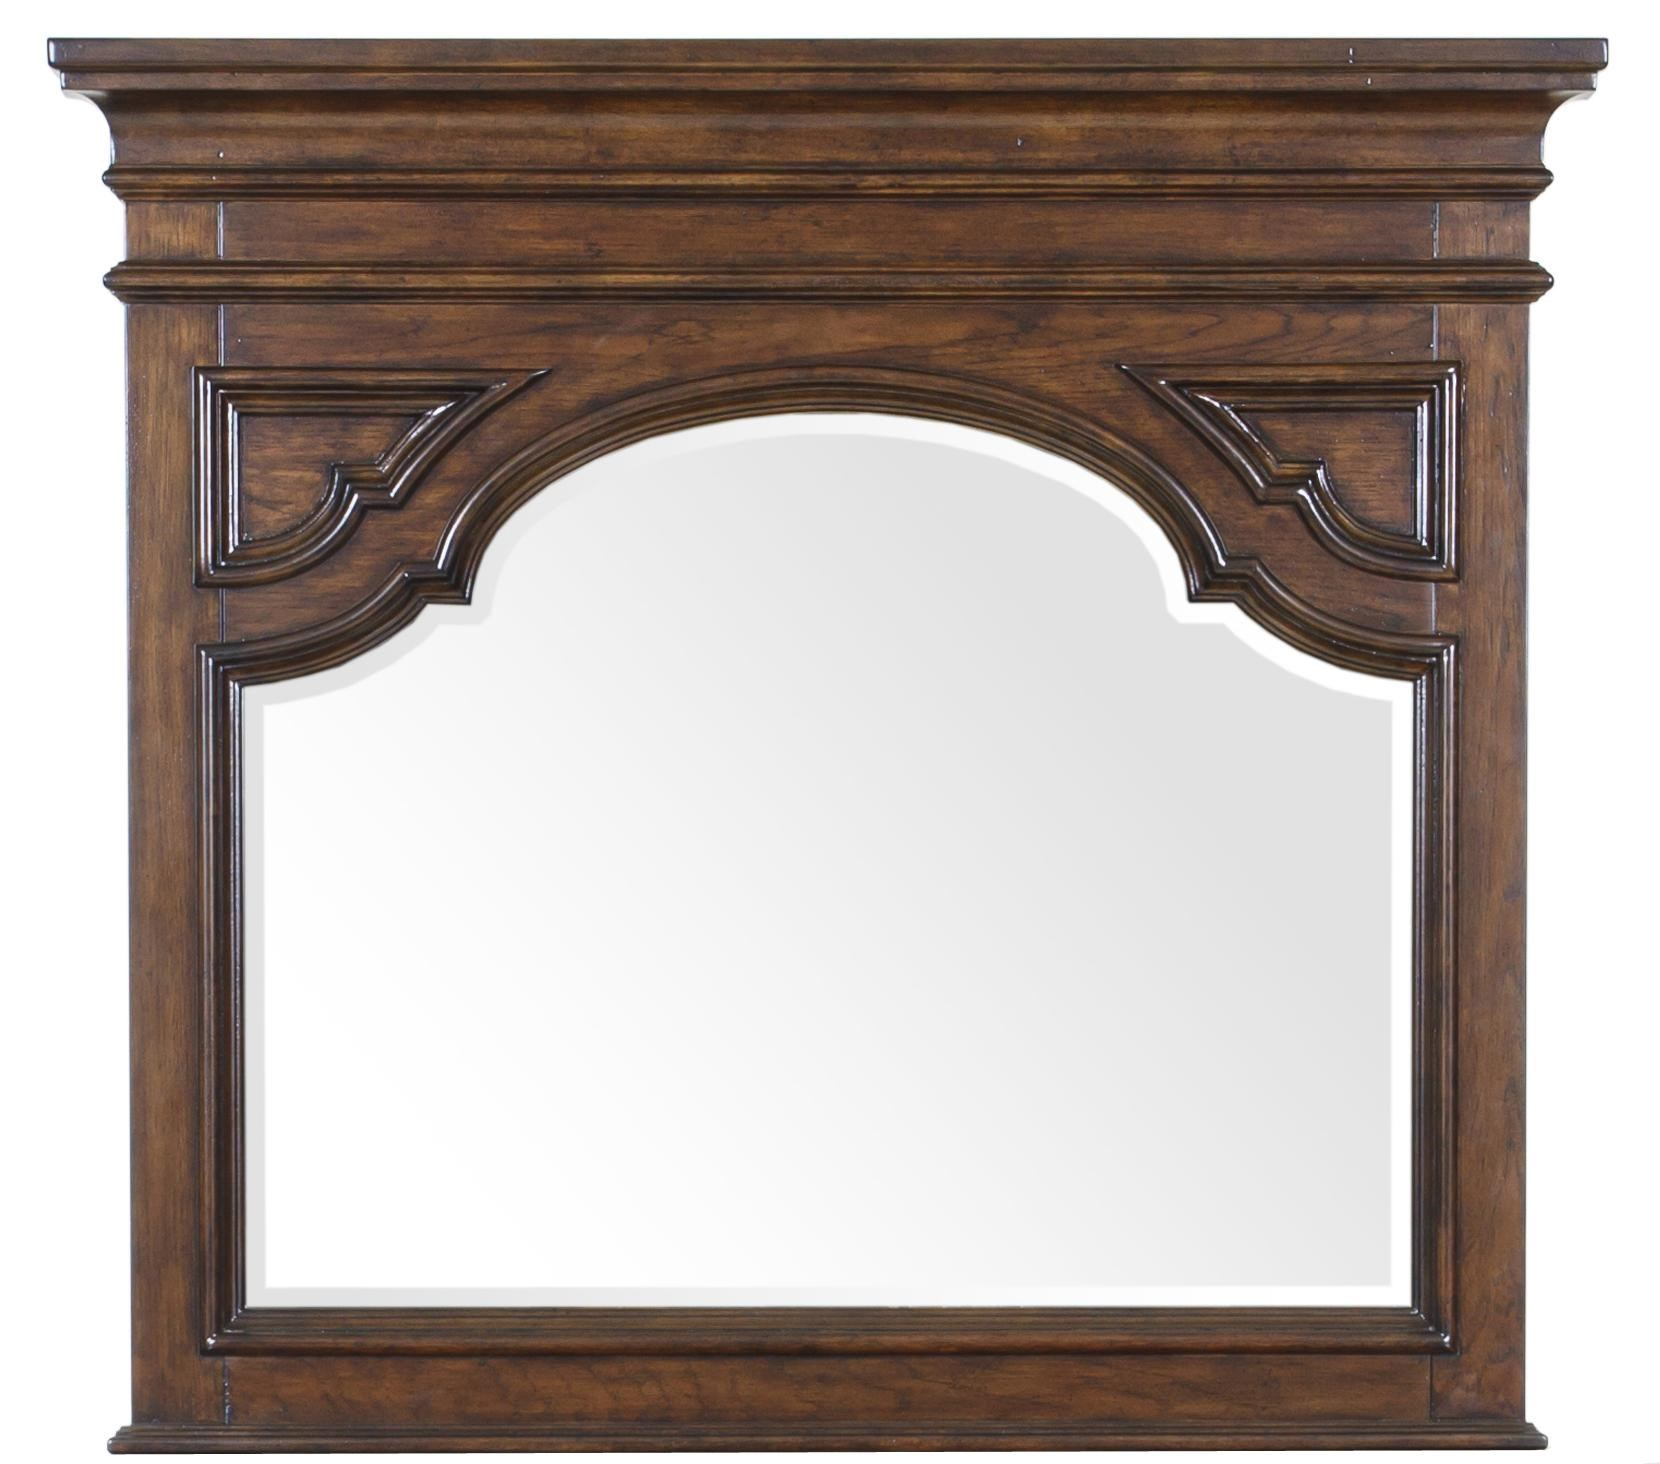 Pulaski Furniture Durango Ridge Beveled Framed Mirror